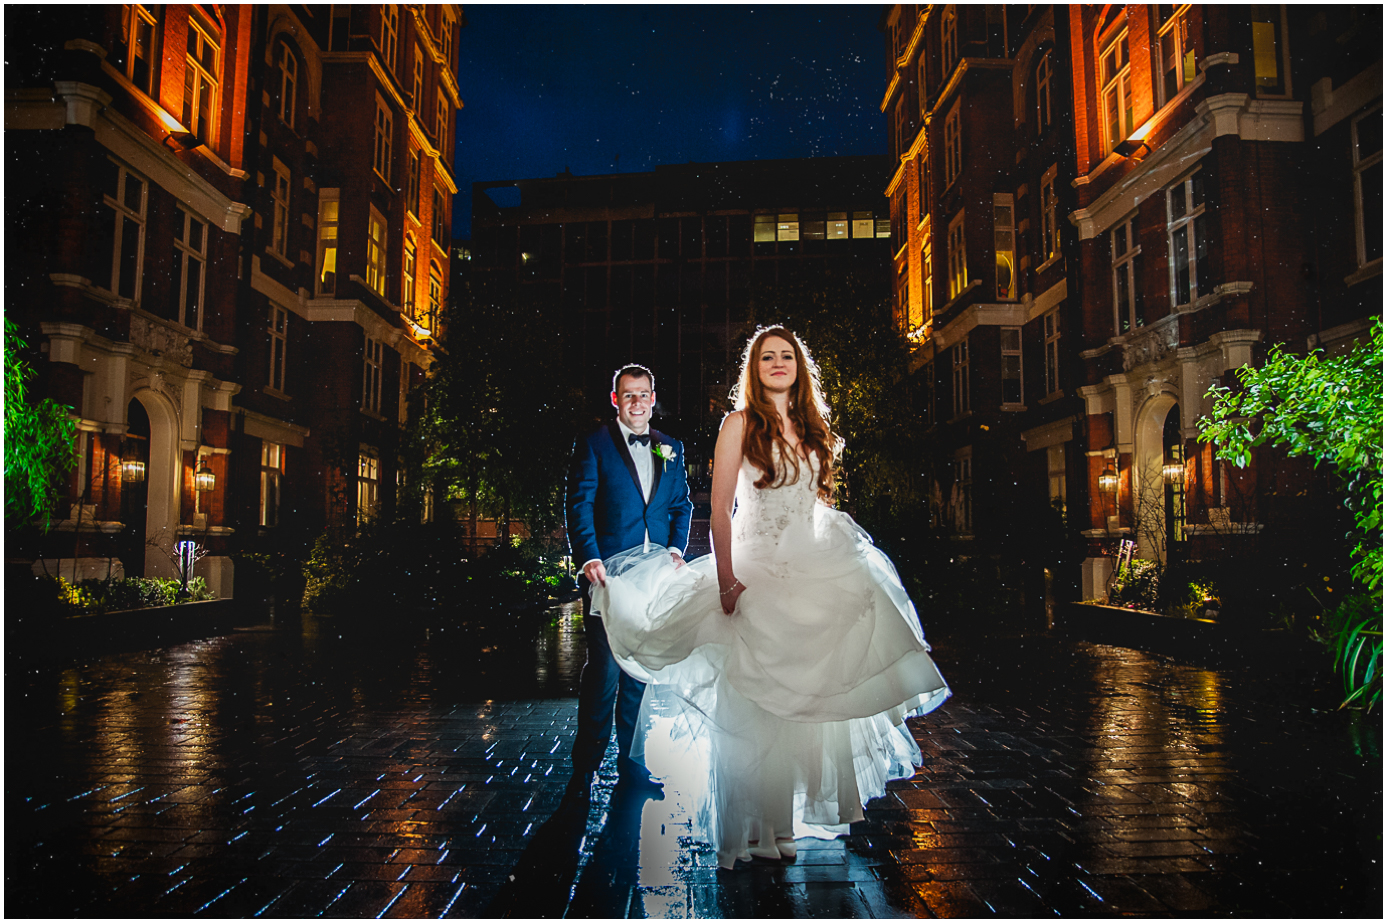 51 - Esmat and Angus - St. Ermin's Hotel London wedding photographer